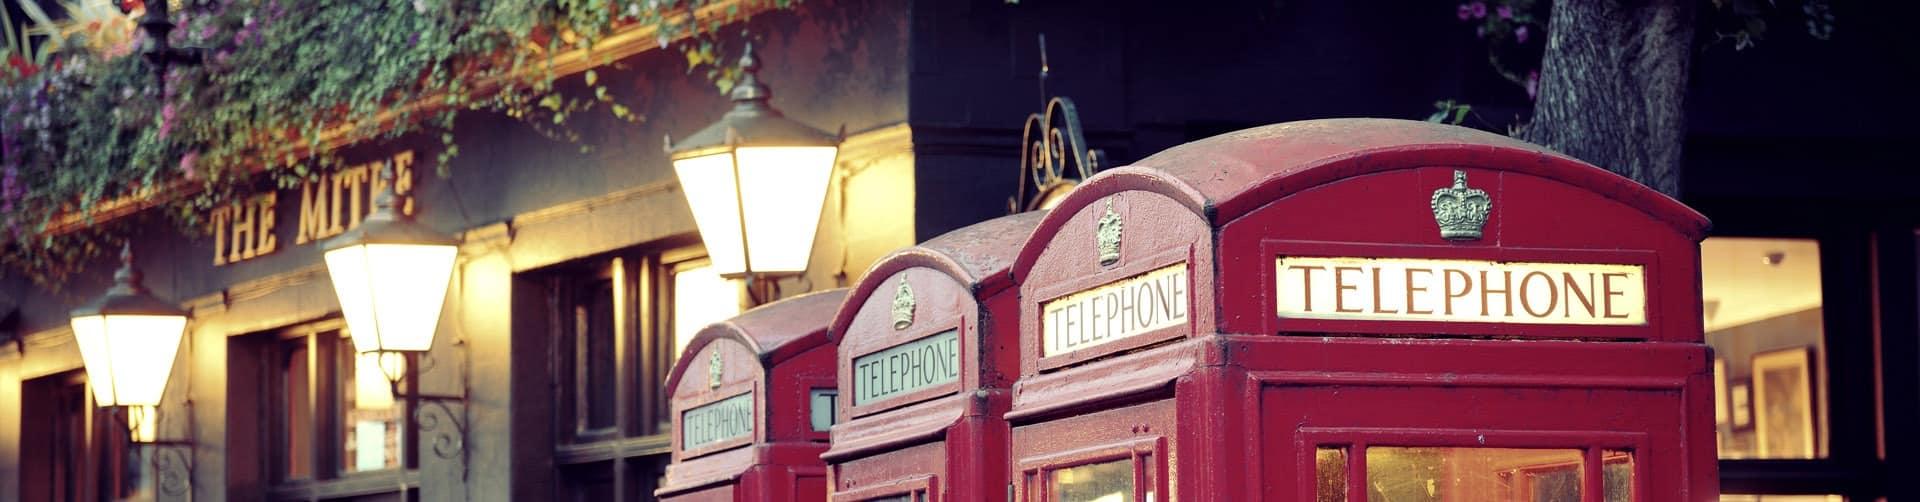 LONDON, UK - SEP 27: London Street view with telephone box on Se